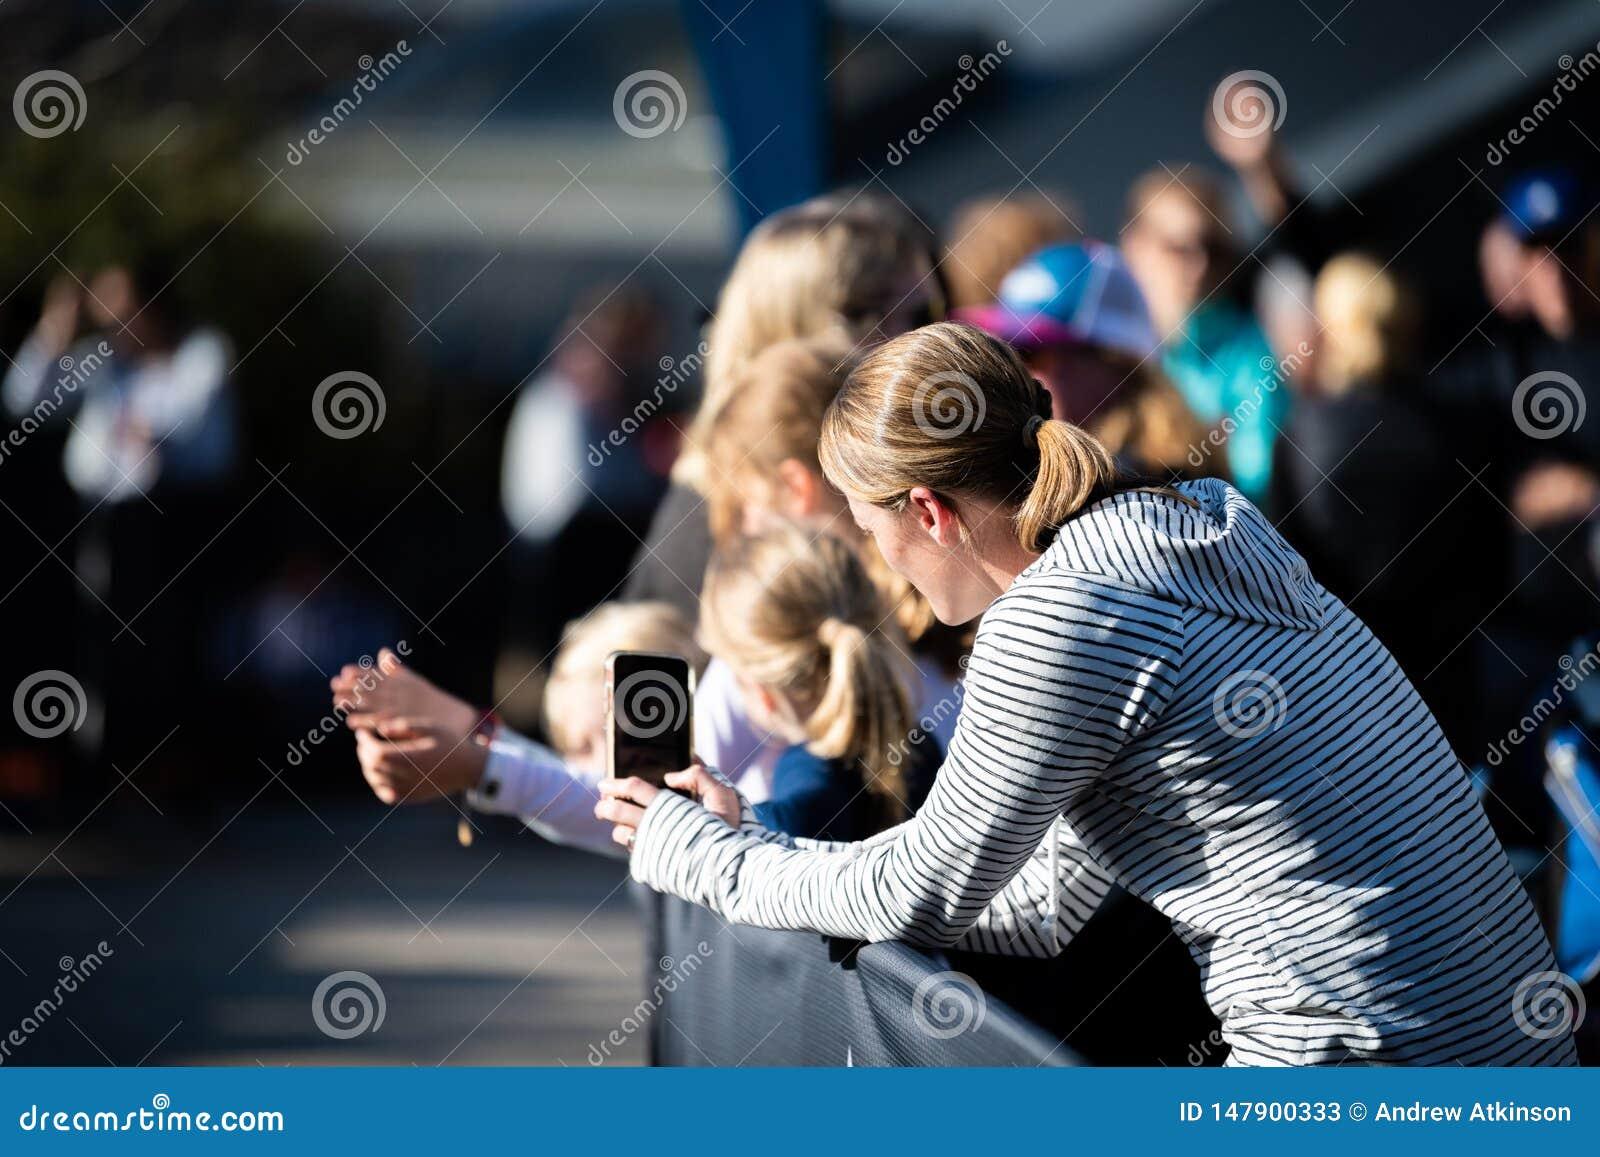 E Kvinnavideolöpare på hennes telefon omkring som ska avslutas på hem- elasticitet